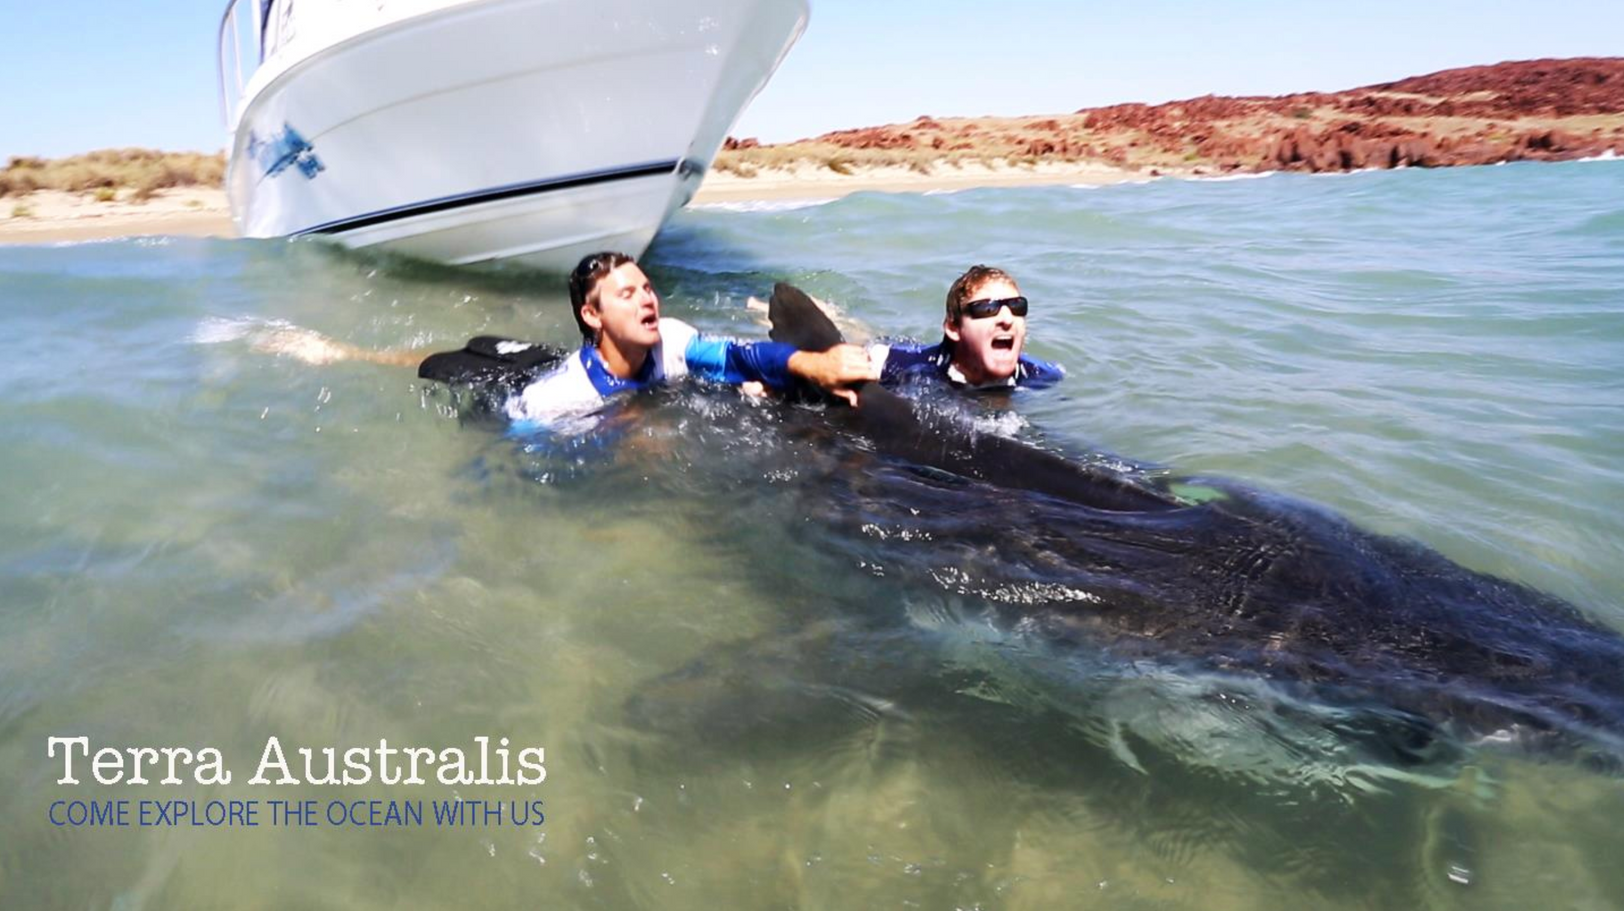 Terra Australis Tags a 4 meter tiger shark